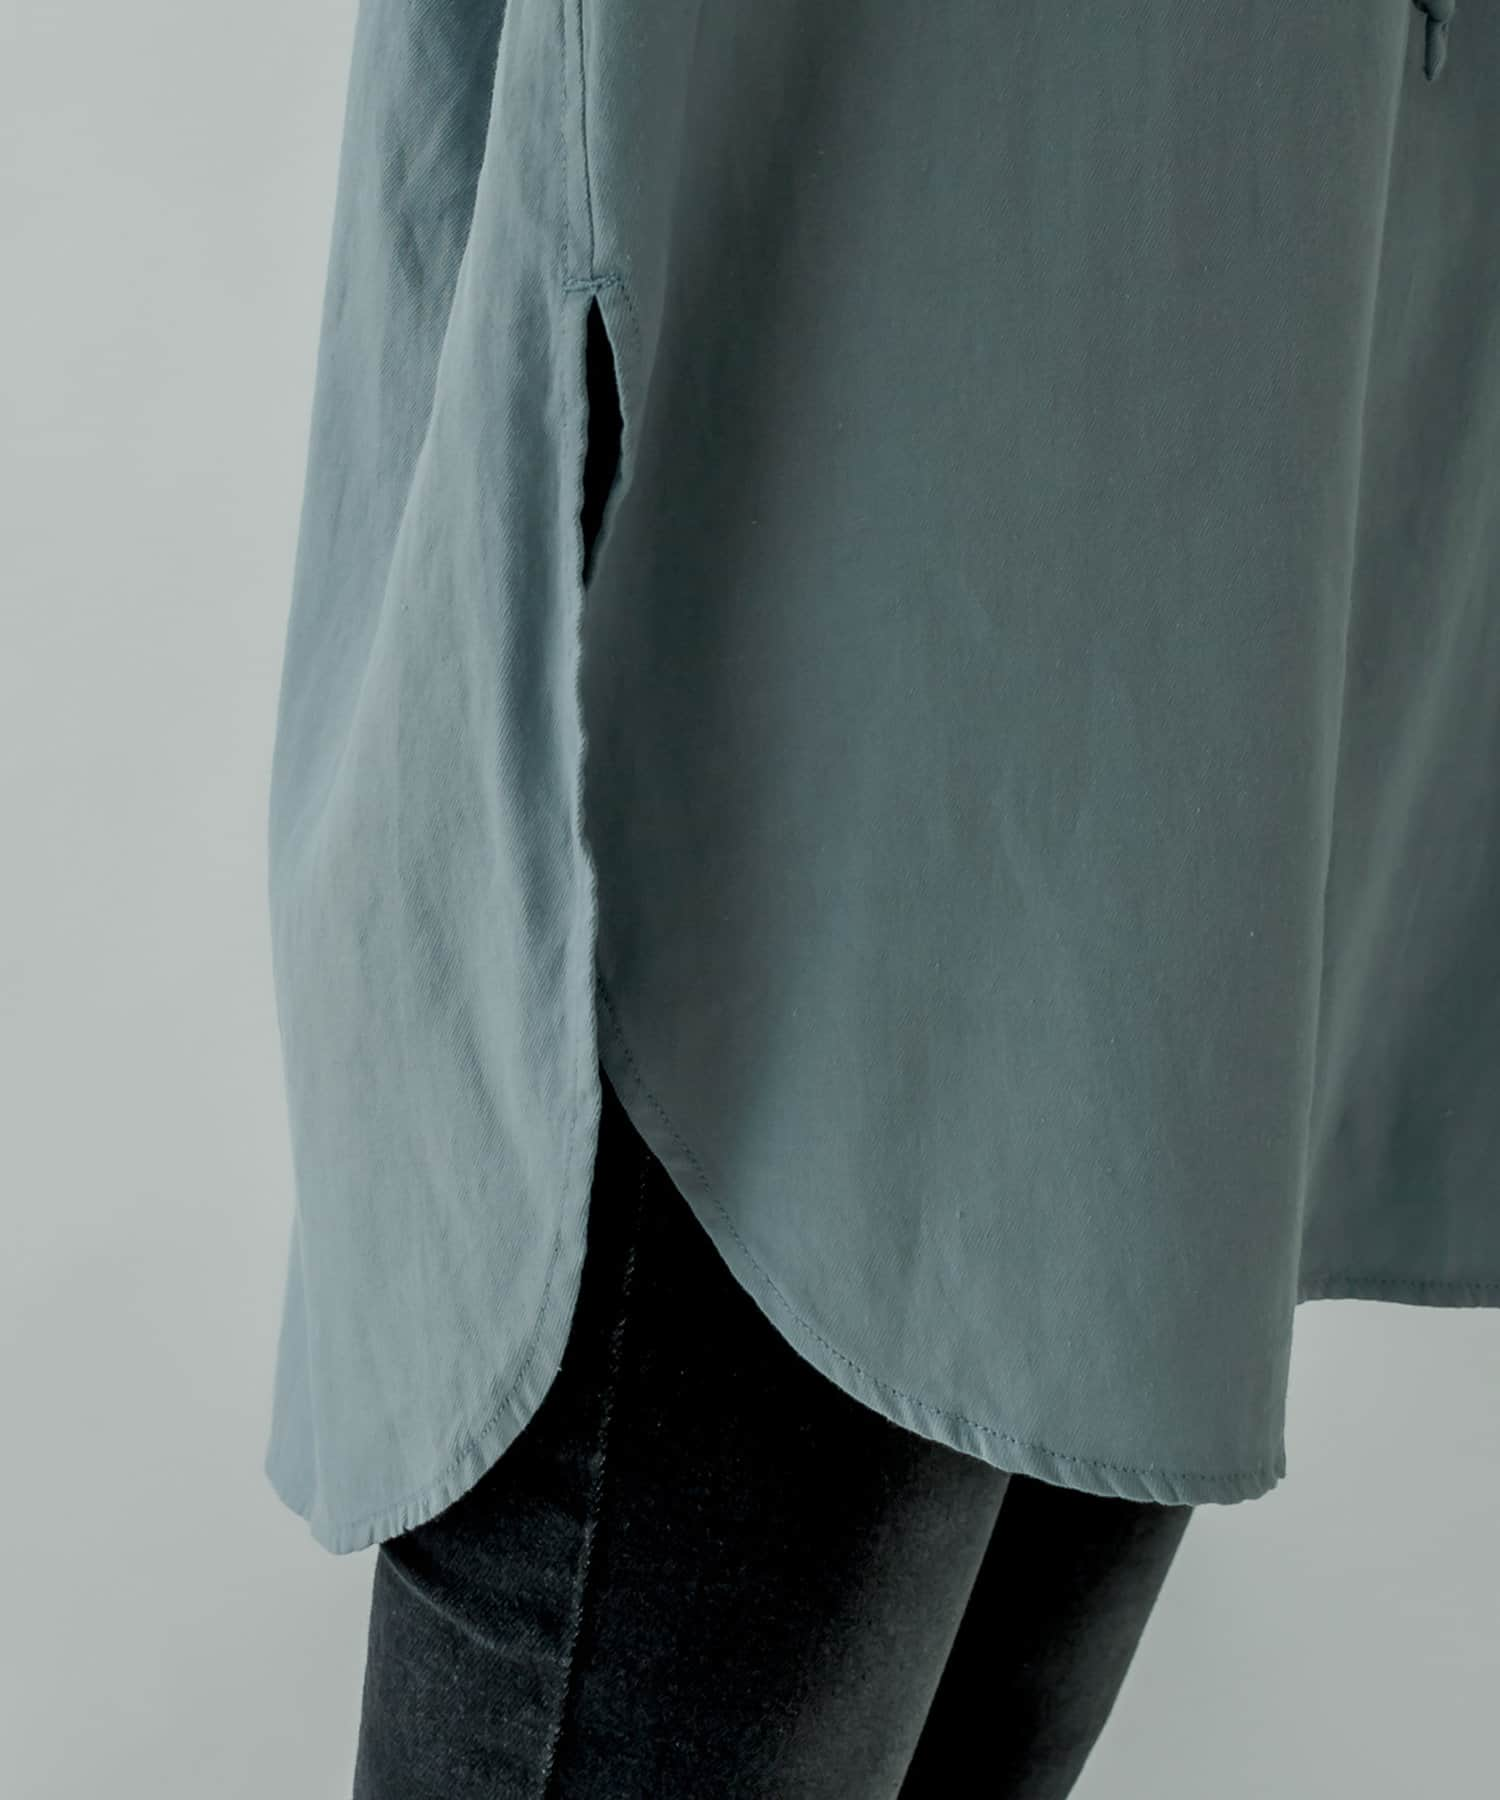 mystic(ミスティック) ボリュームレースアップシャツ